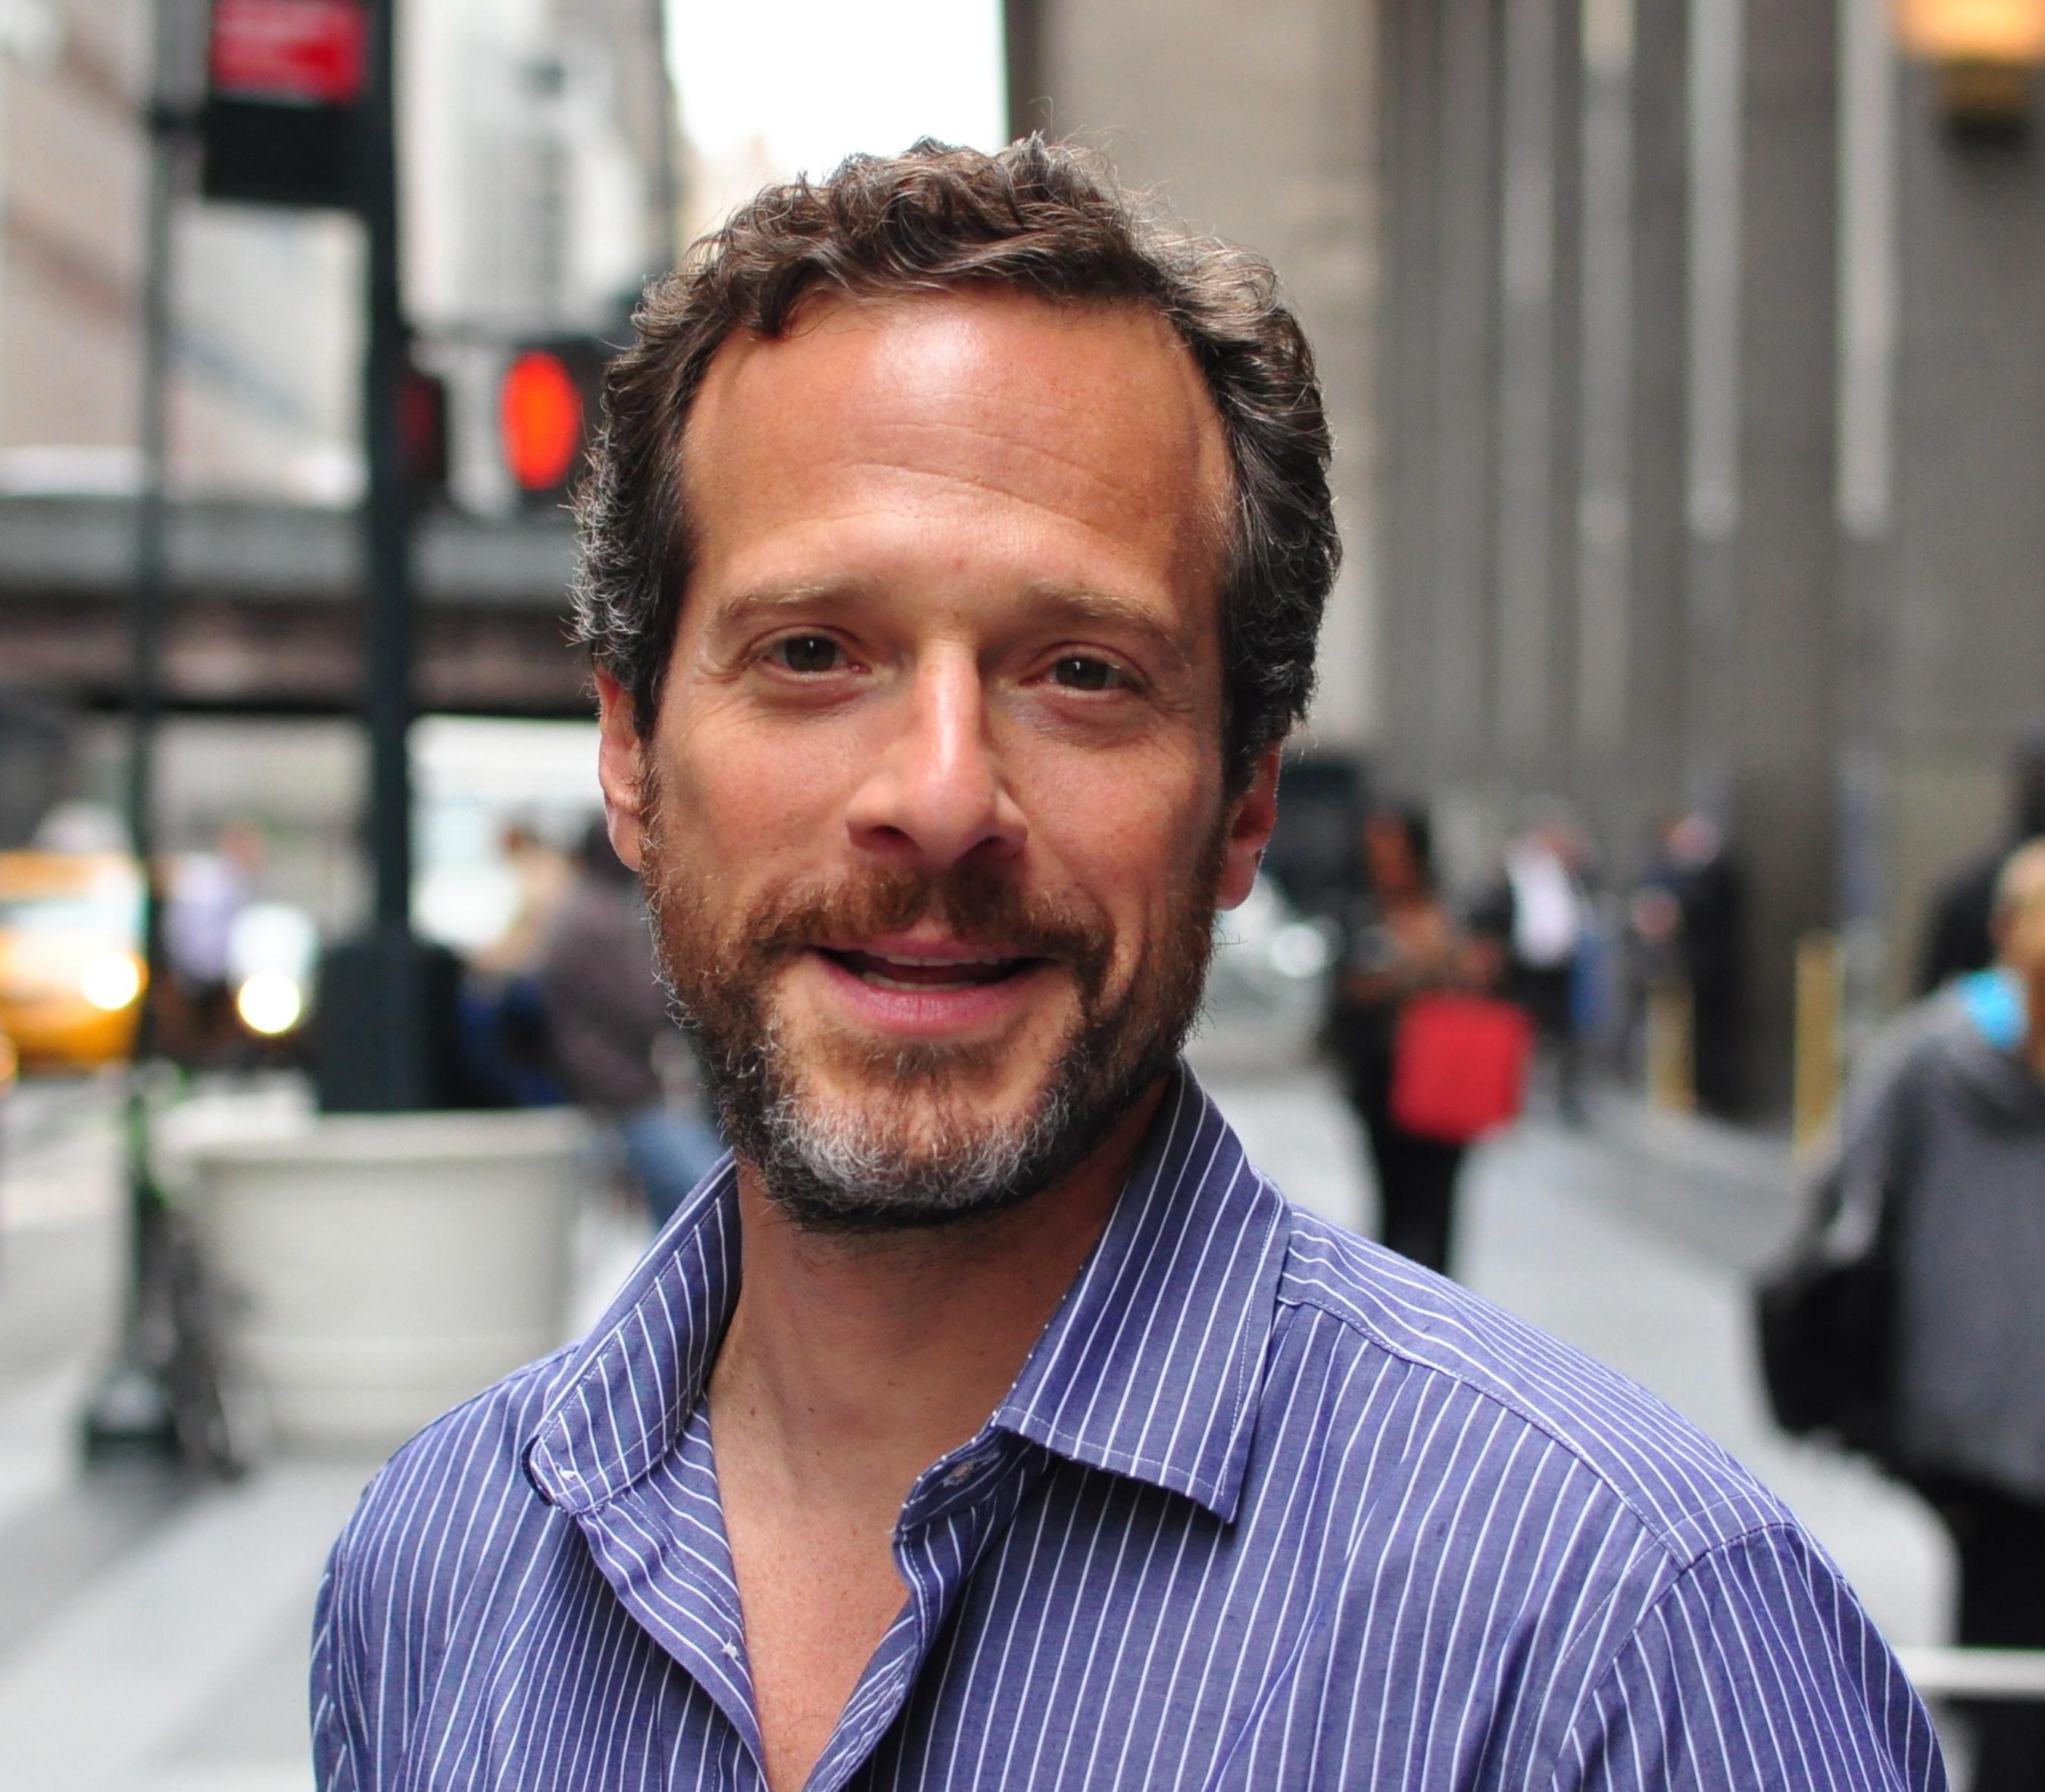 David U. Simon - SocialFlow CMO